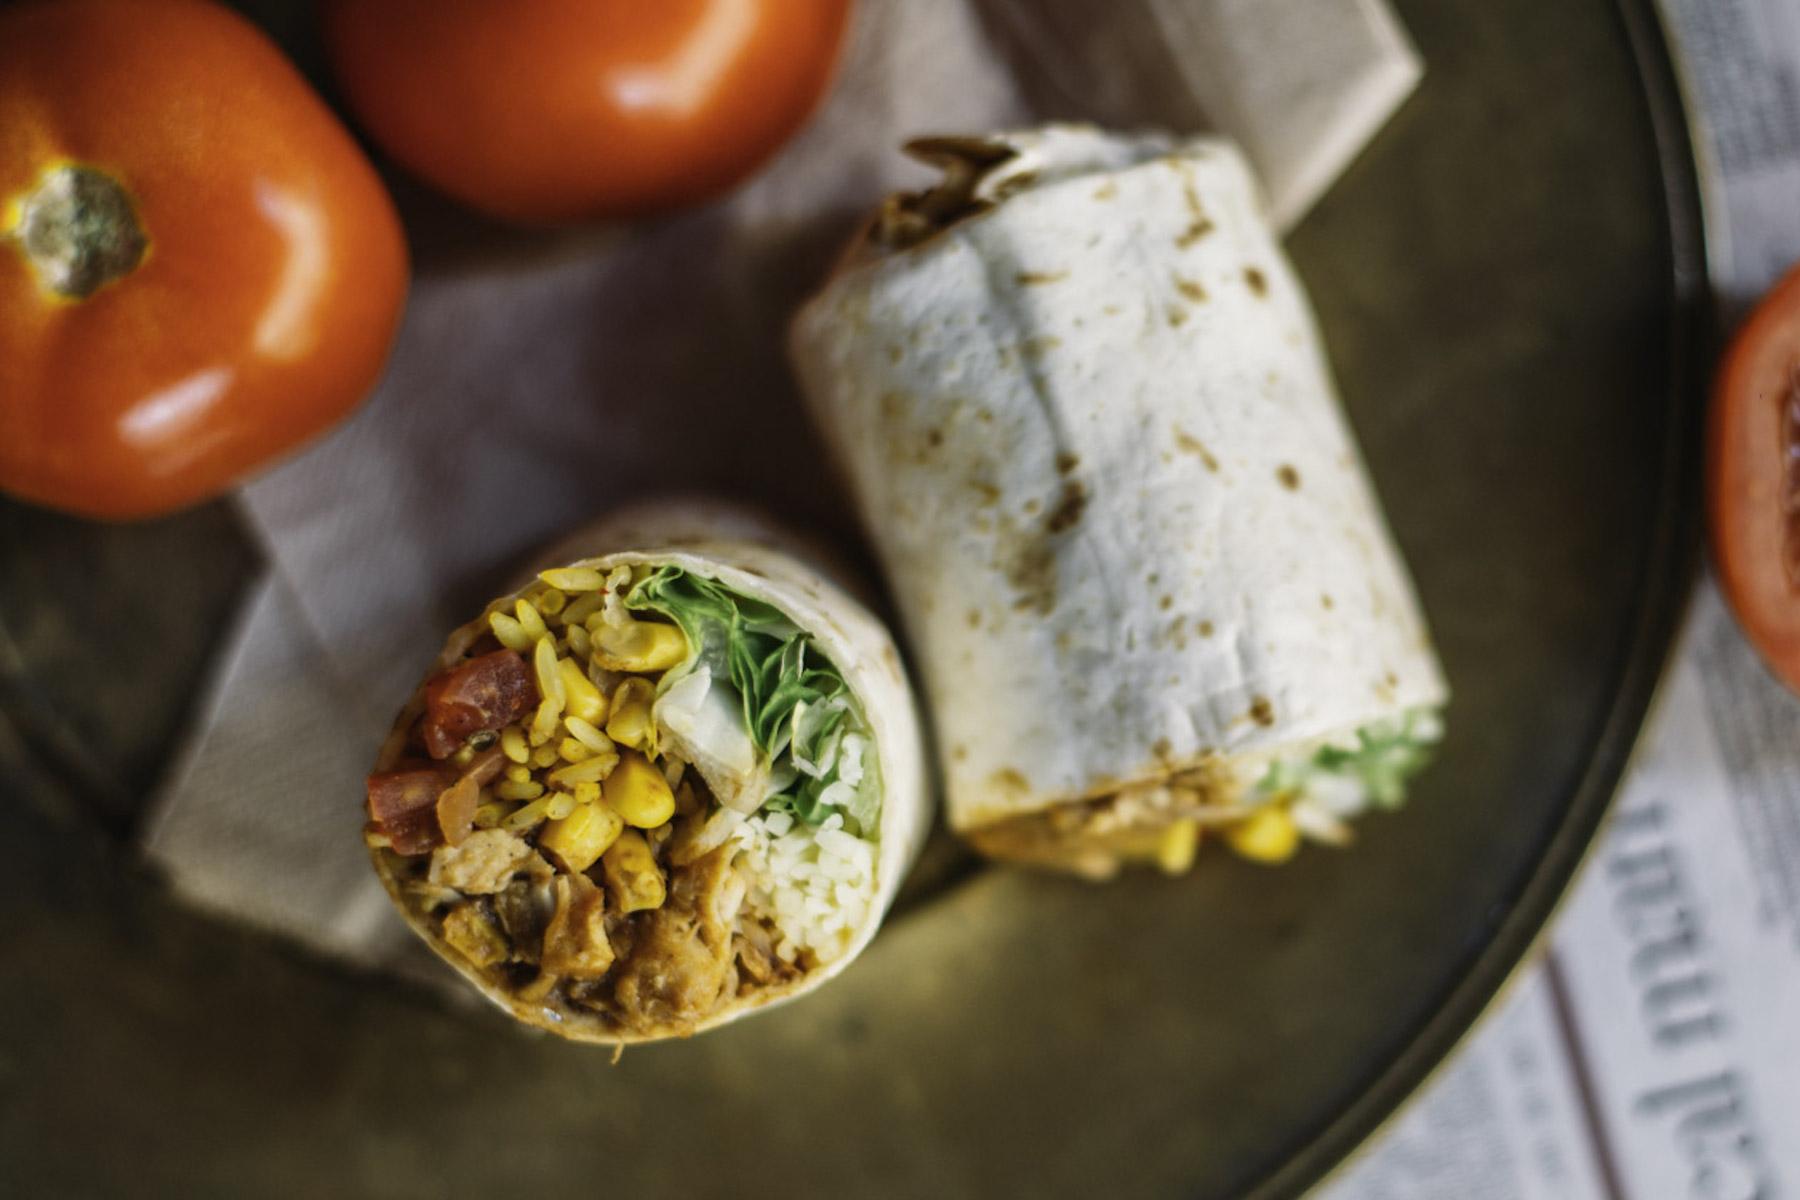 burrito-company-fraeulein-edith-deliveroo_chicken-burrinho_-3-2.jpg